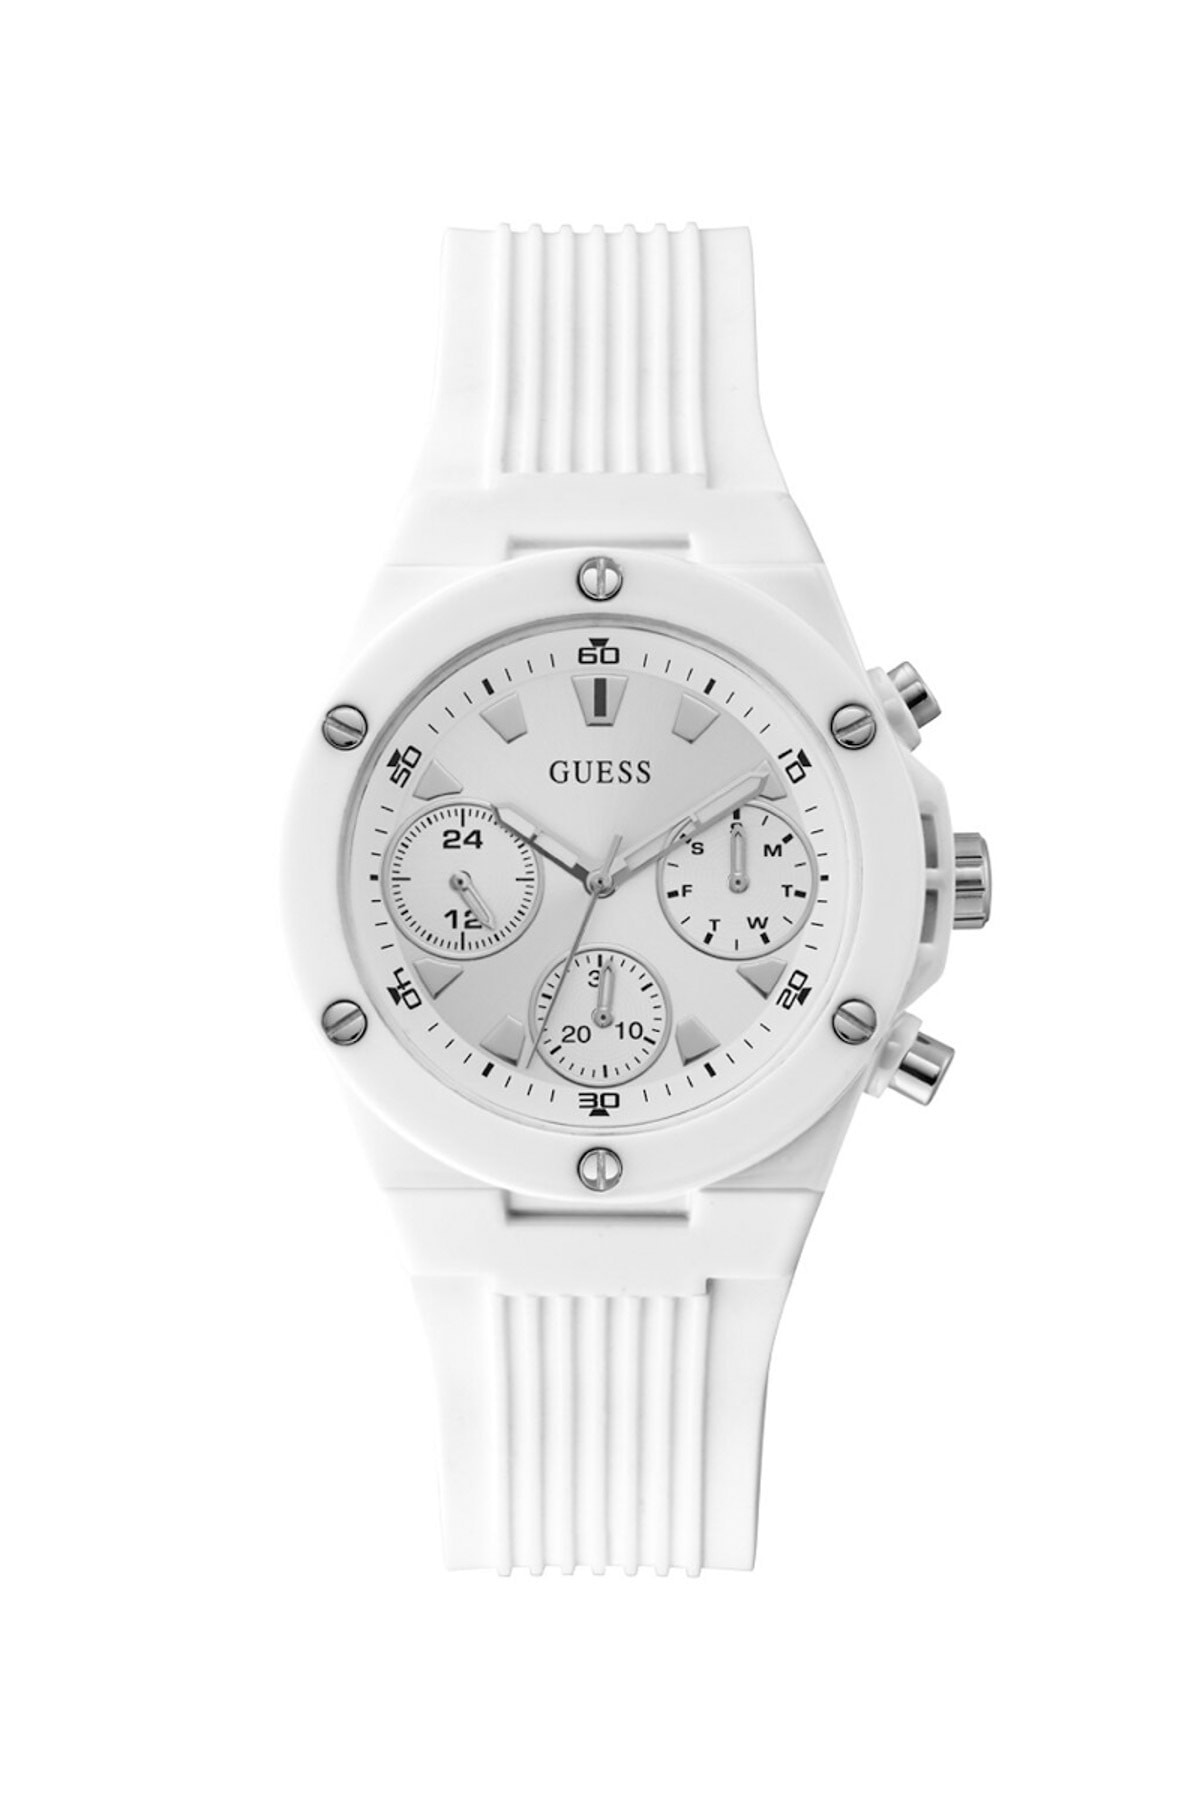 خرید نقدی ساعت مچی زنانه لوکس برند Guess کد ty102176858